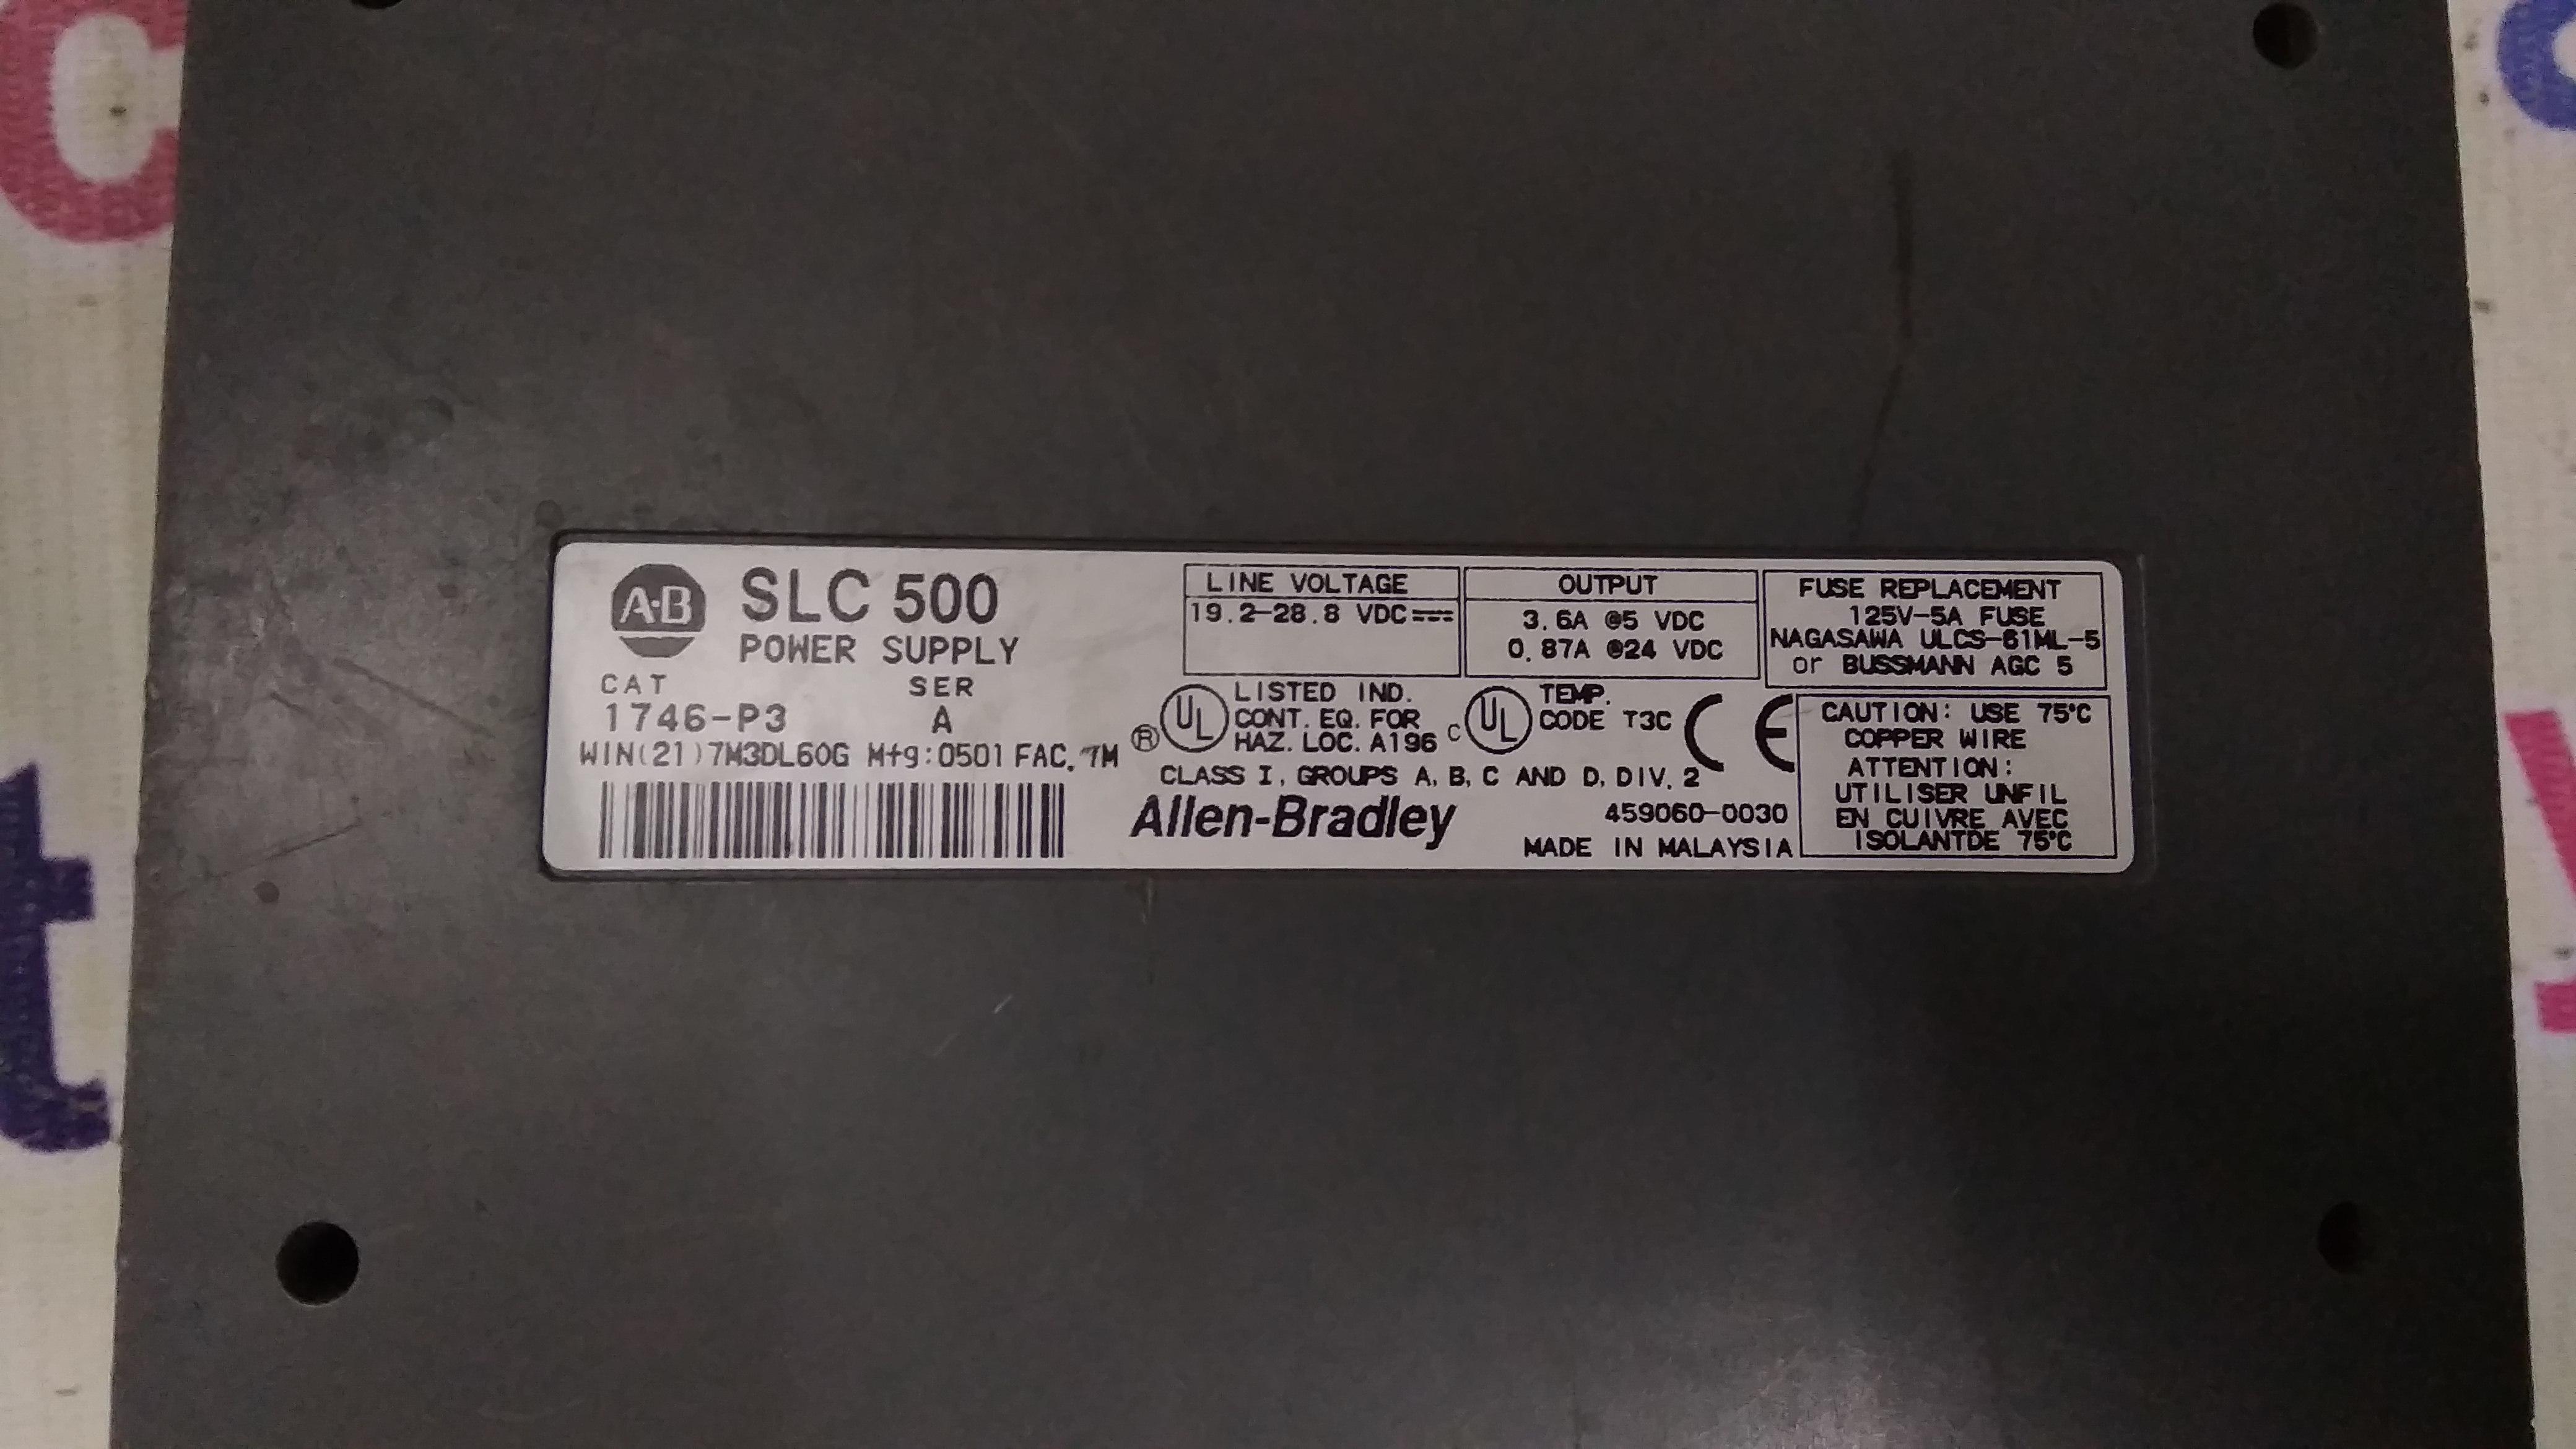 ALLEN BRADLY SLC 500 POWER SUPPLY  1746-P3 A